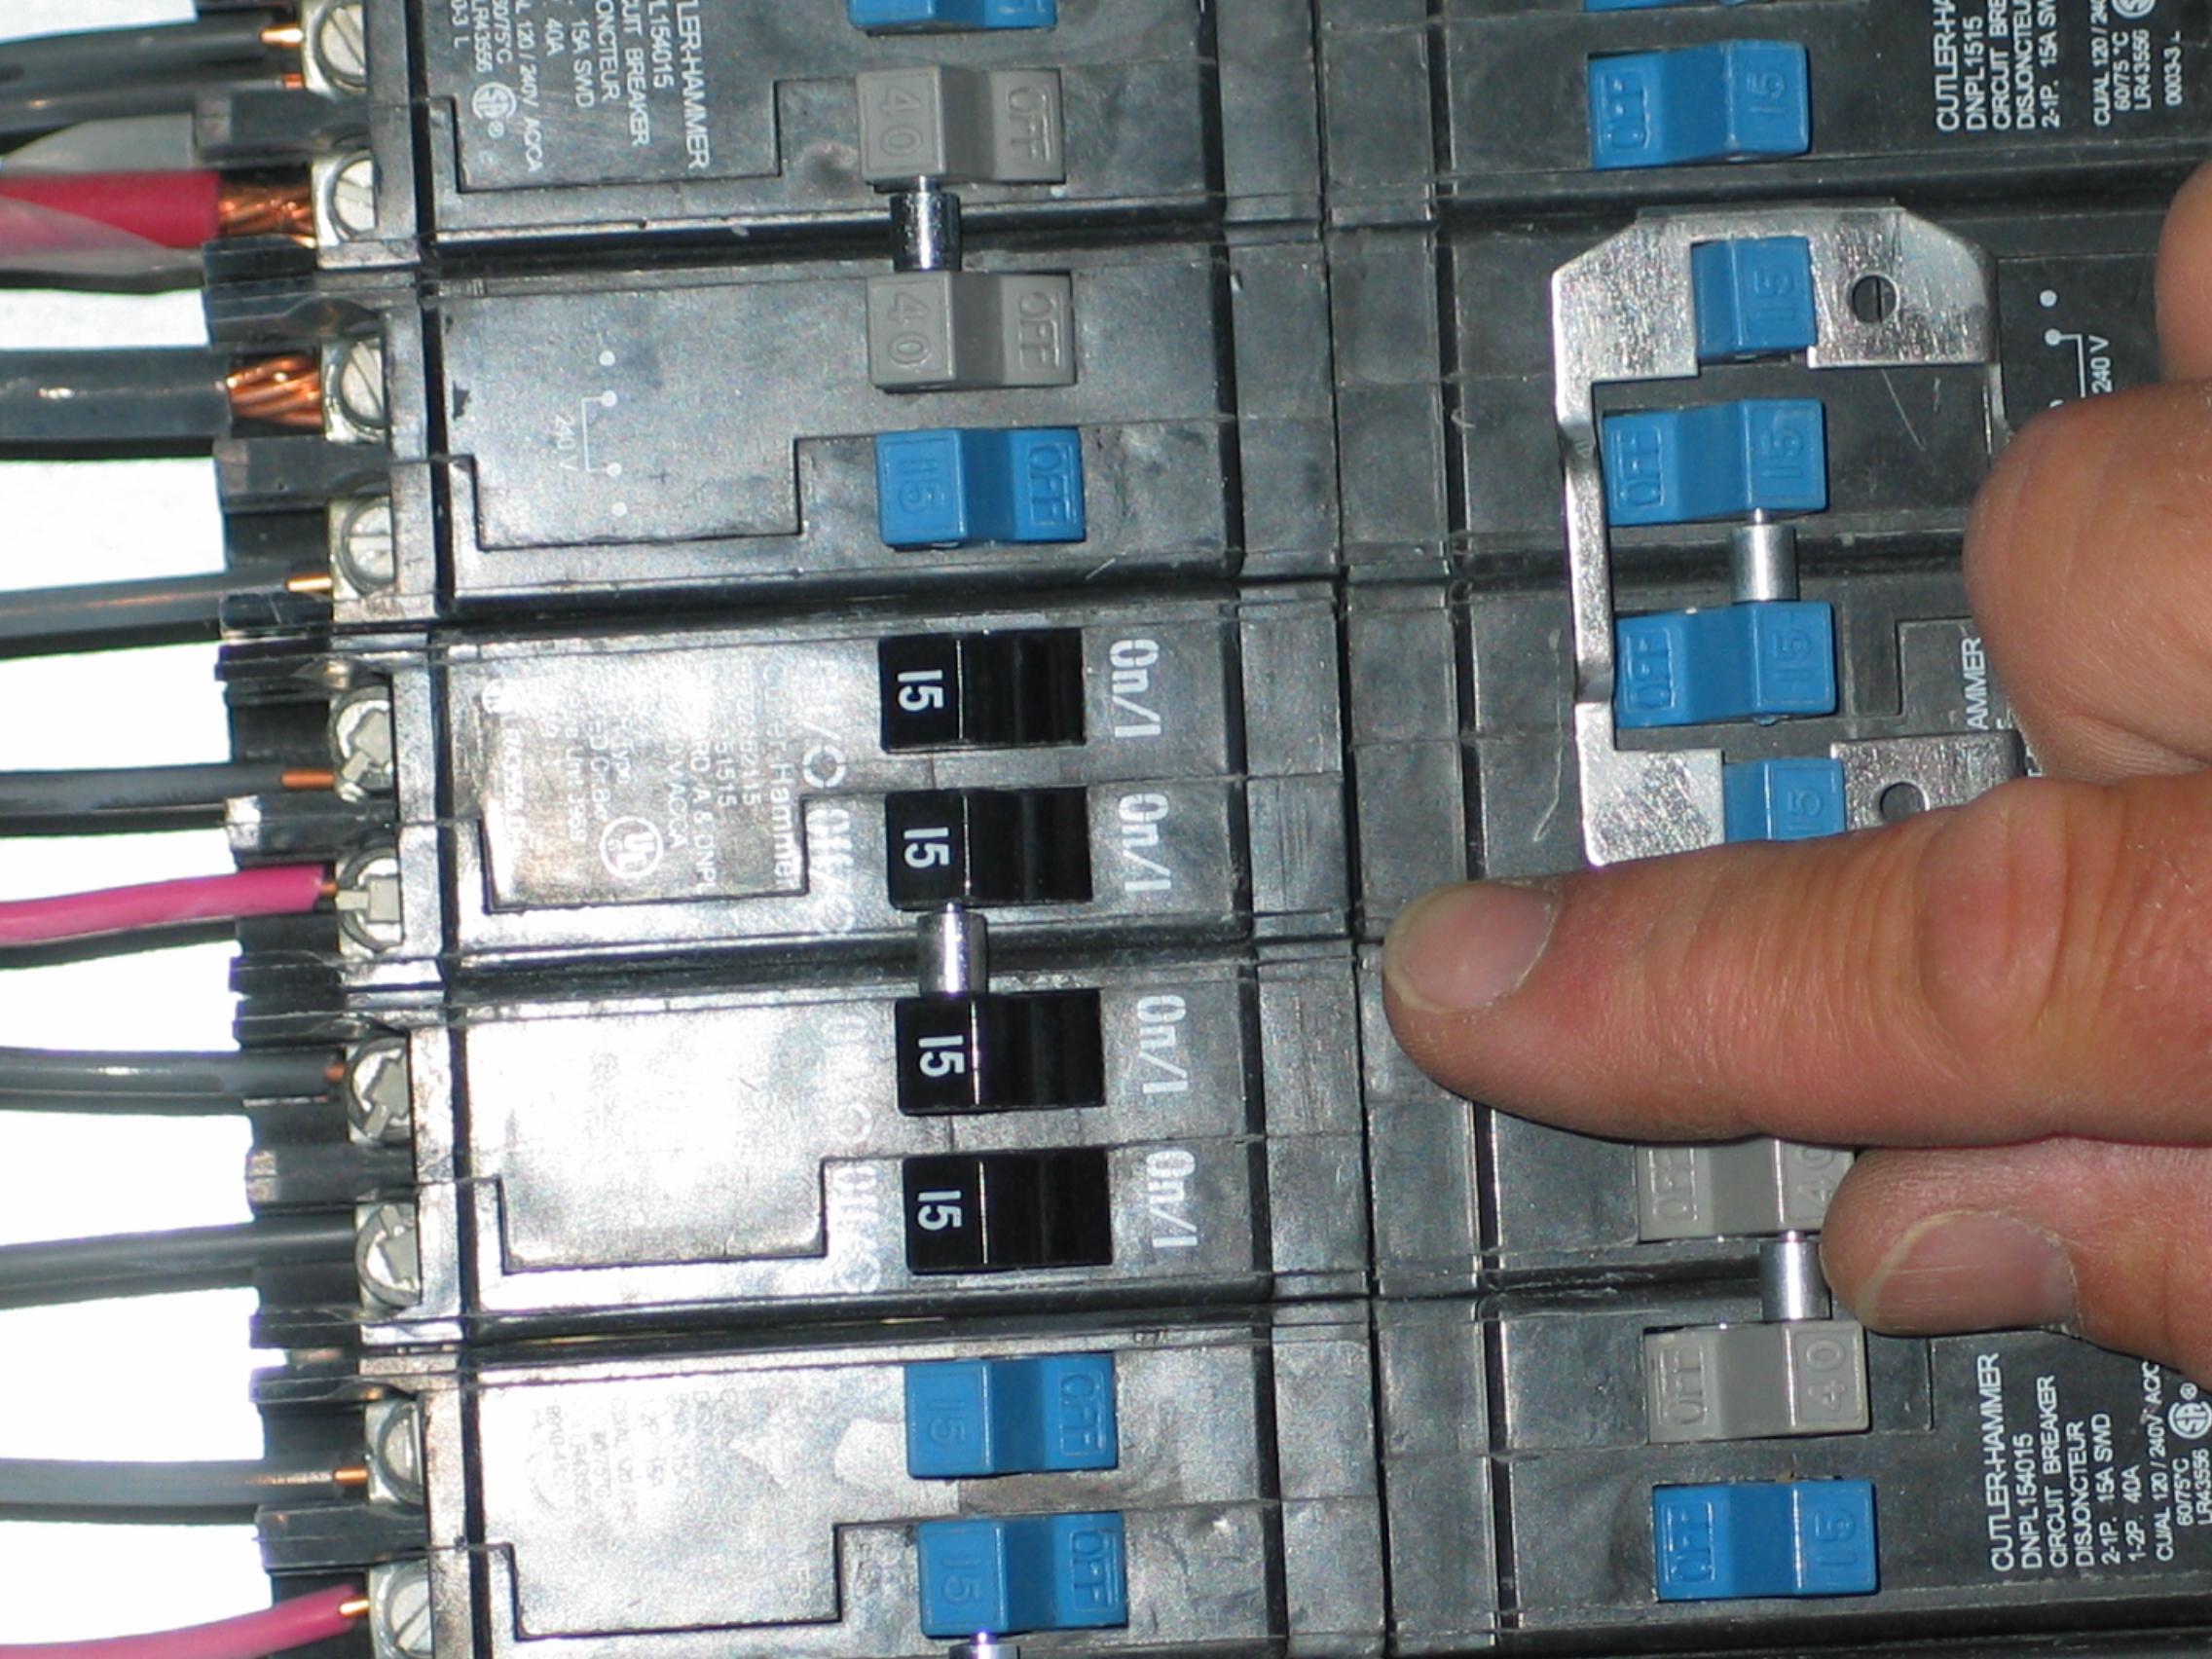 220-240 Wiring Diagram Instructions - Dannychesnut - 2 Pole Circuit Breaker Wiring Diagram